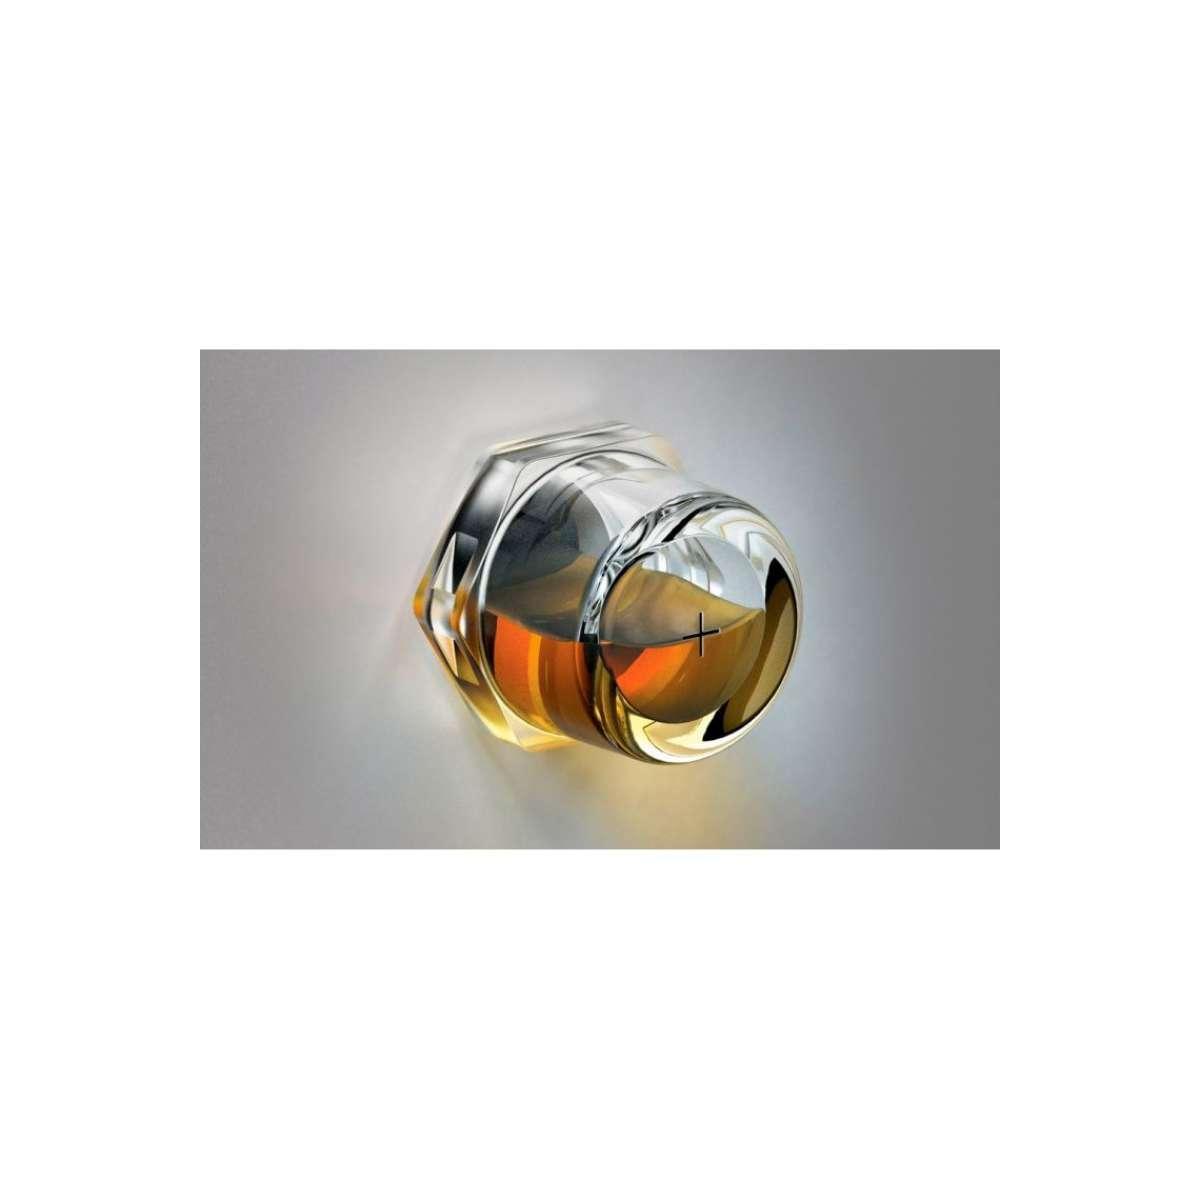 "3D Sight Glass 1-1/2"" NPT"